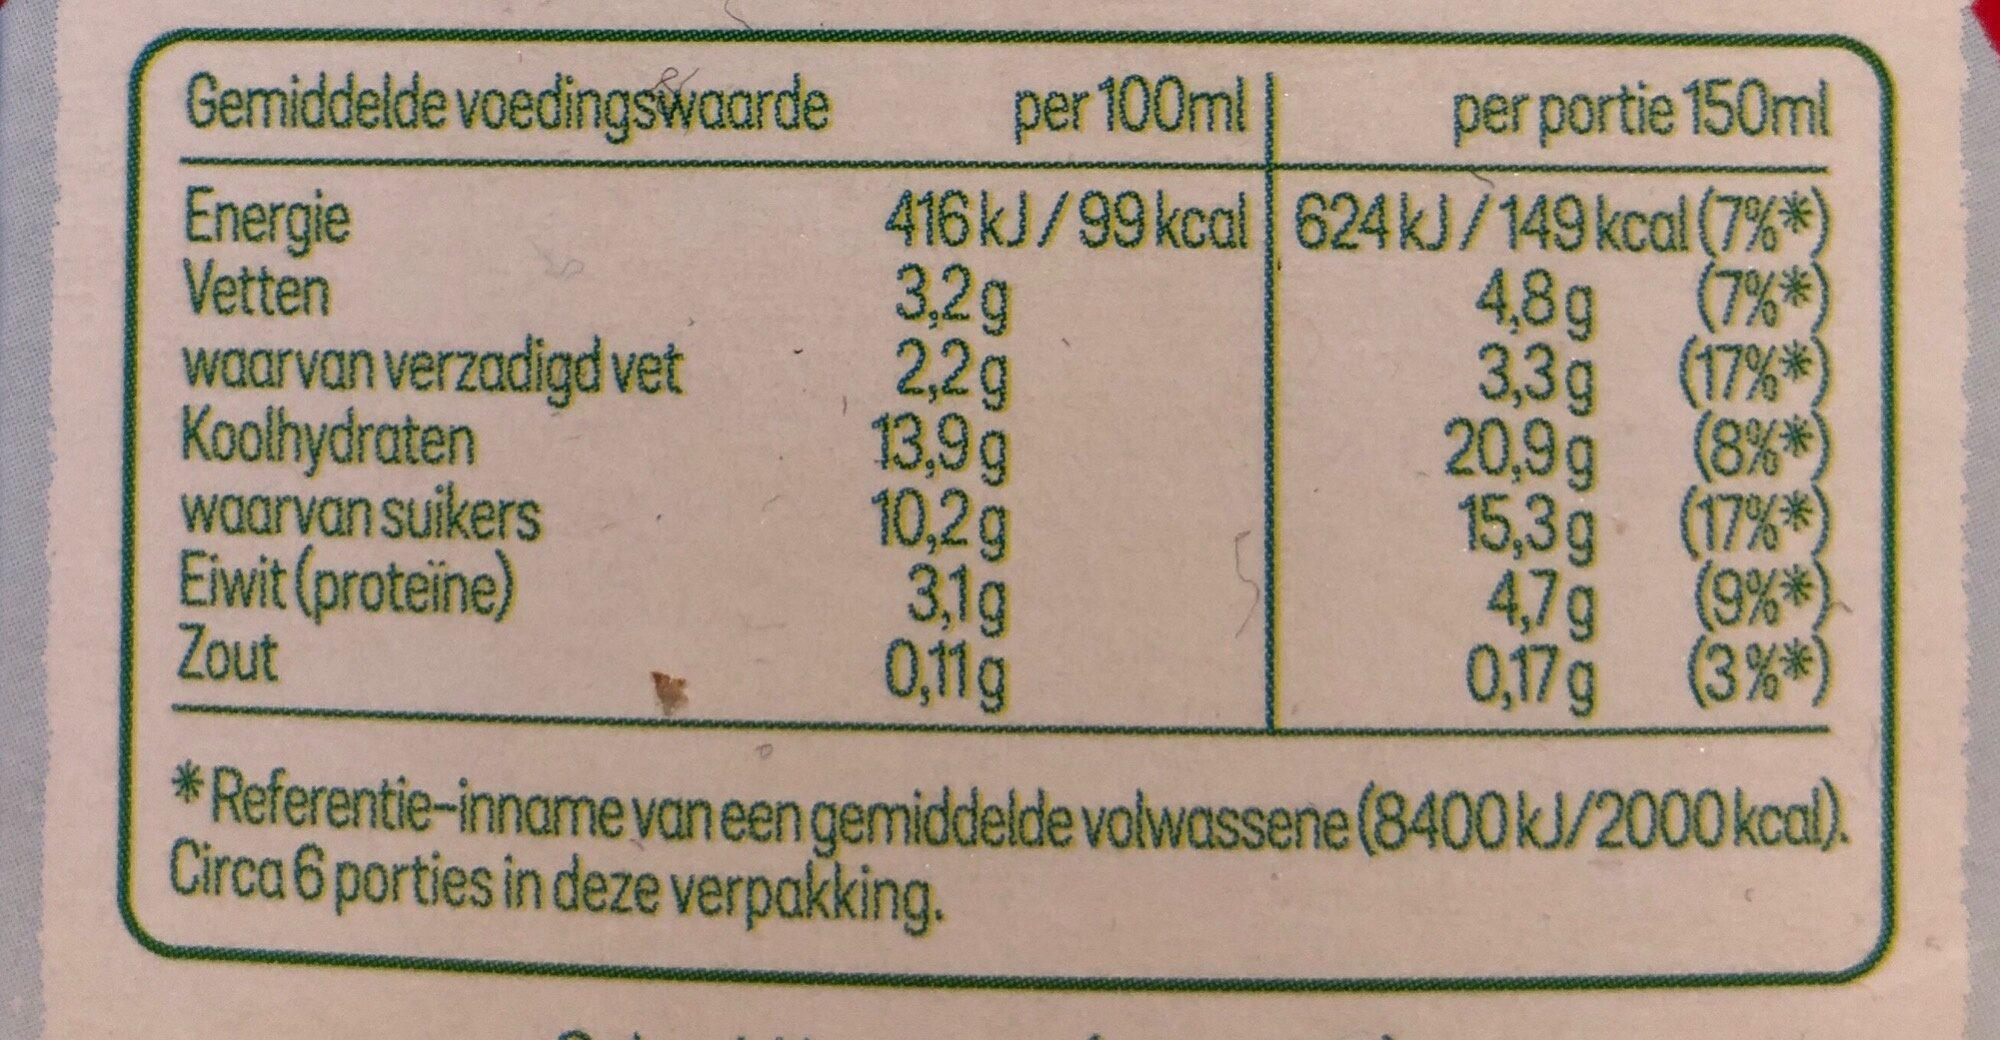 Boer en land Vanillevla - Nutrition facts